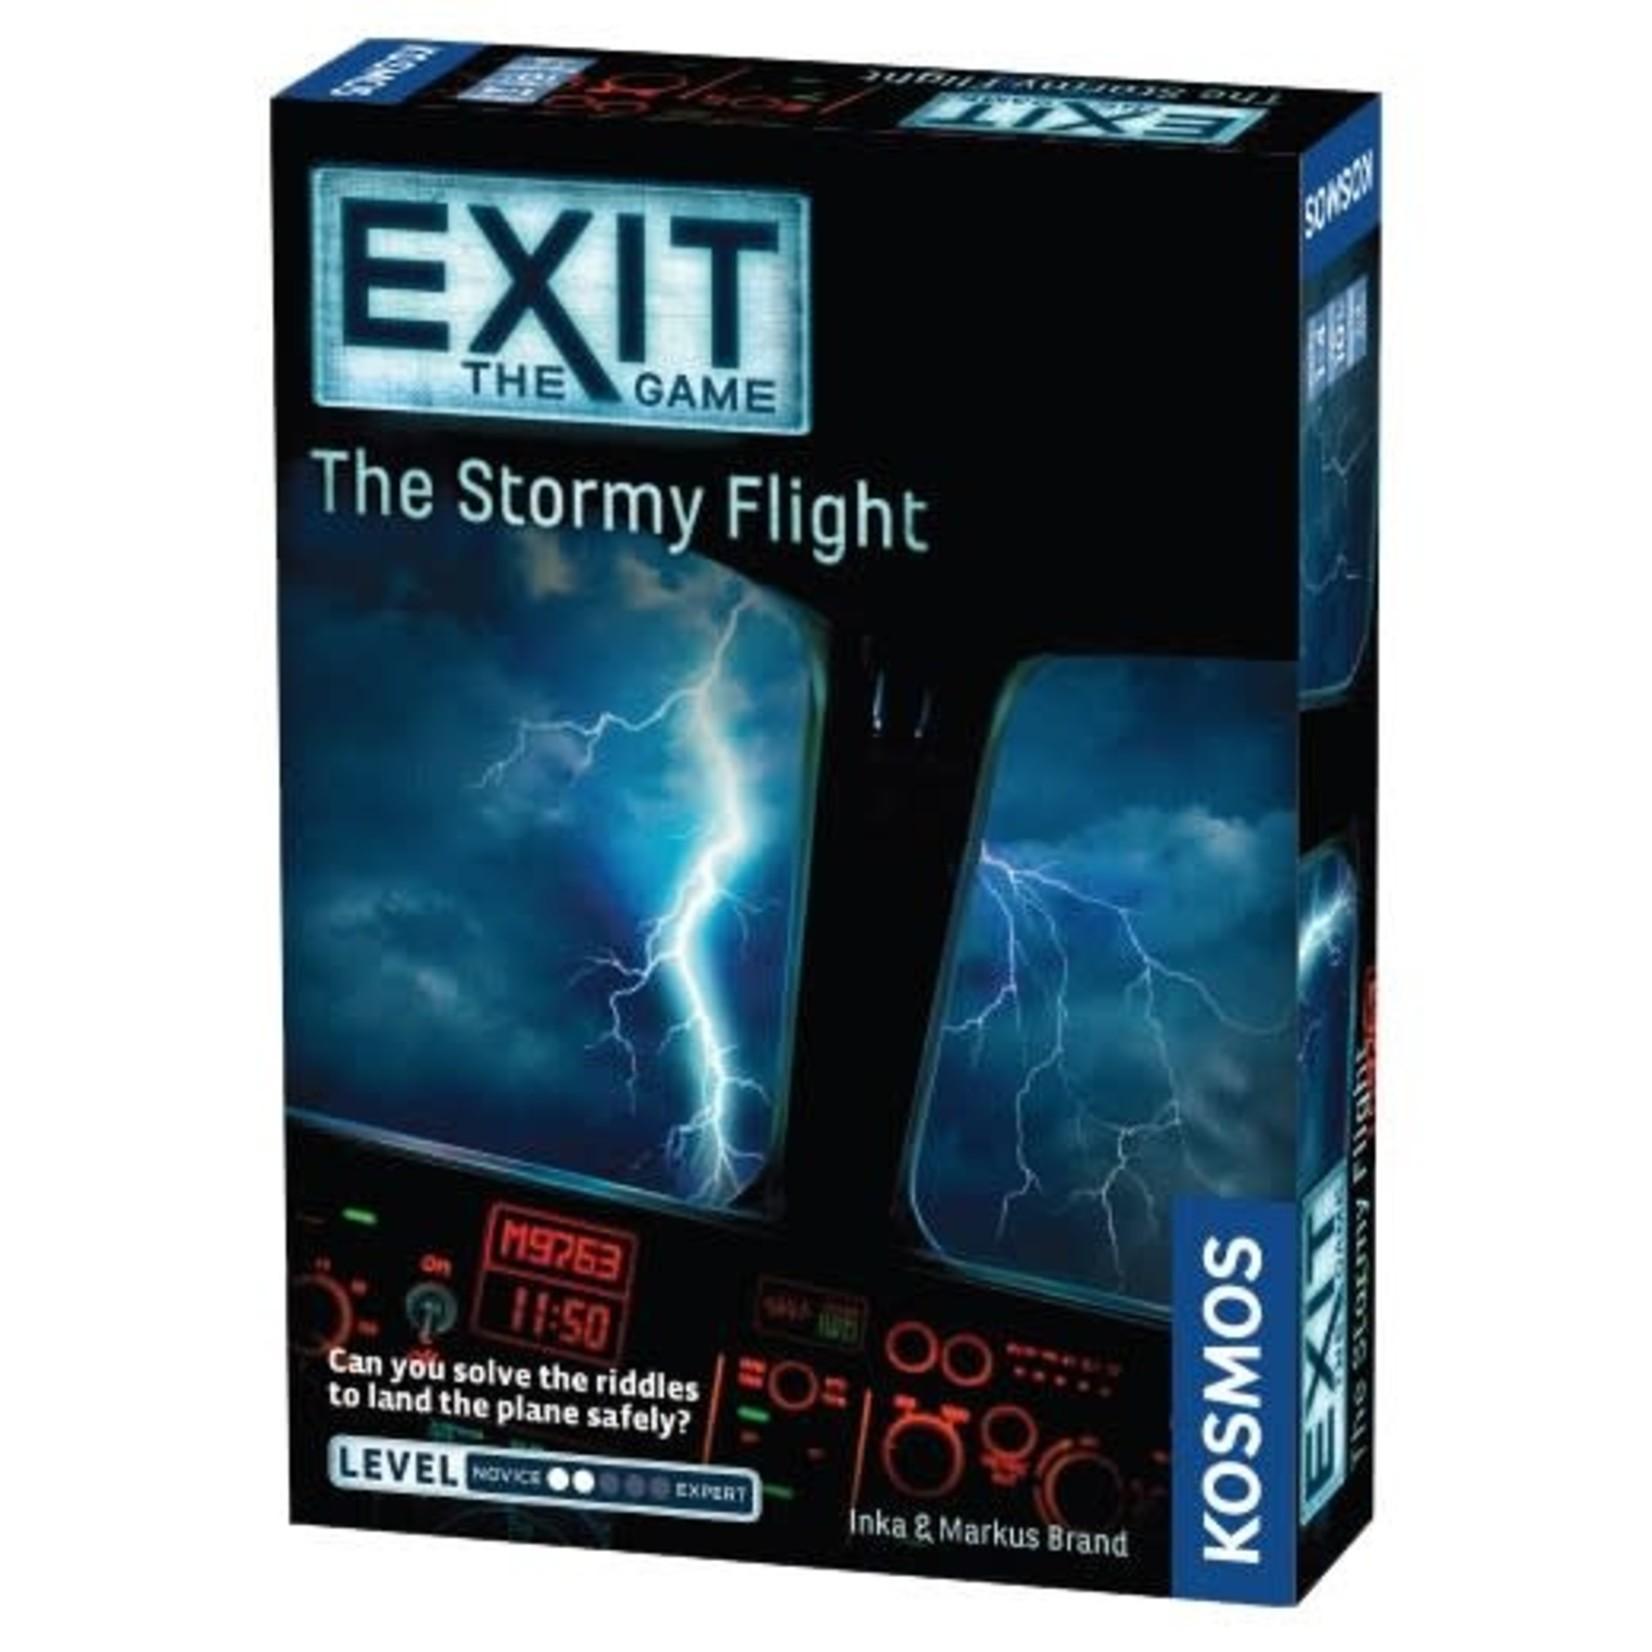 Thames Kosmos Exit: The Stormy Flight